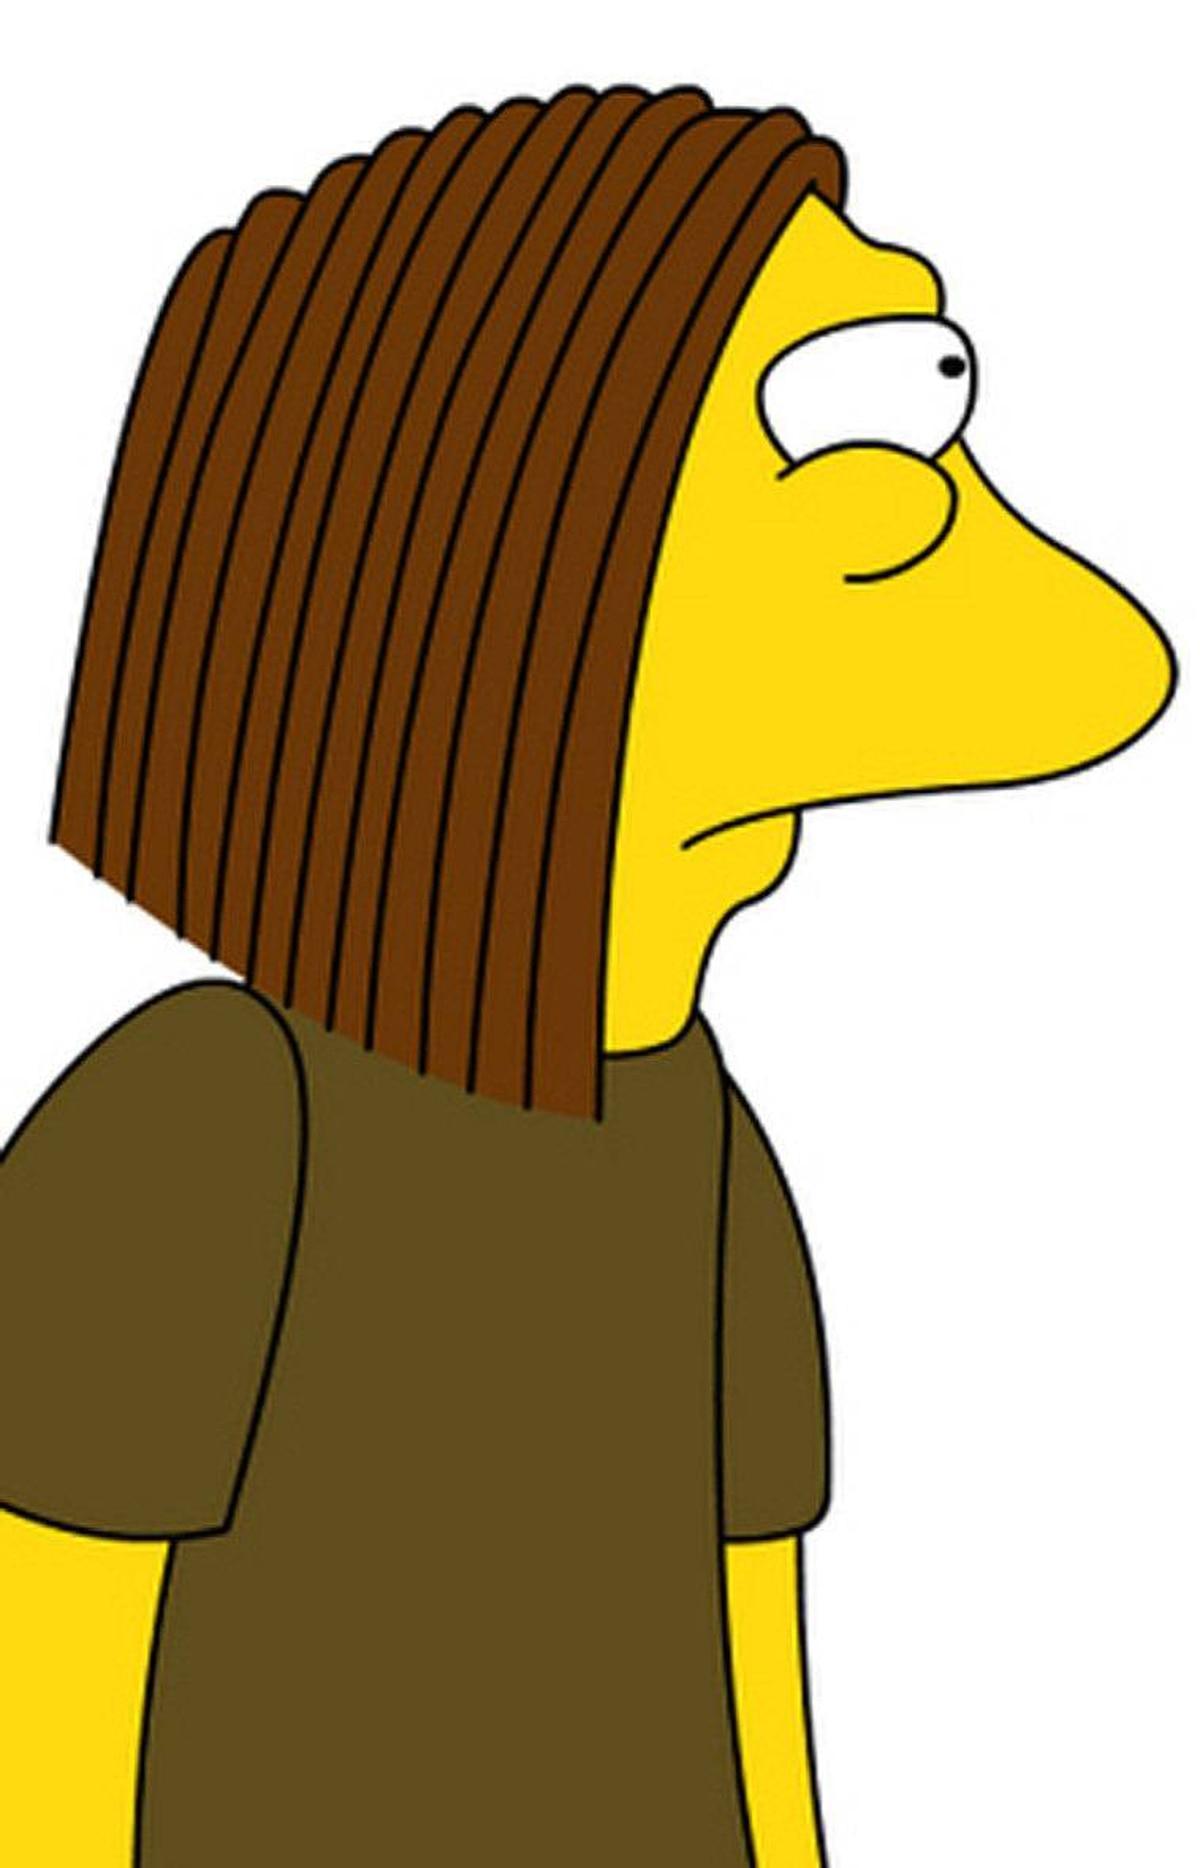 Dolph Starbeam: Simpsons sidekick